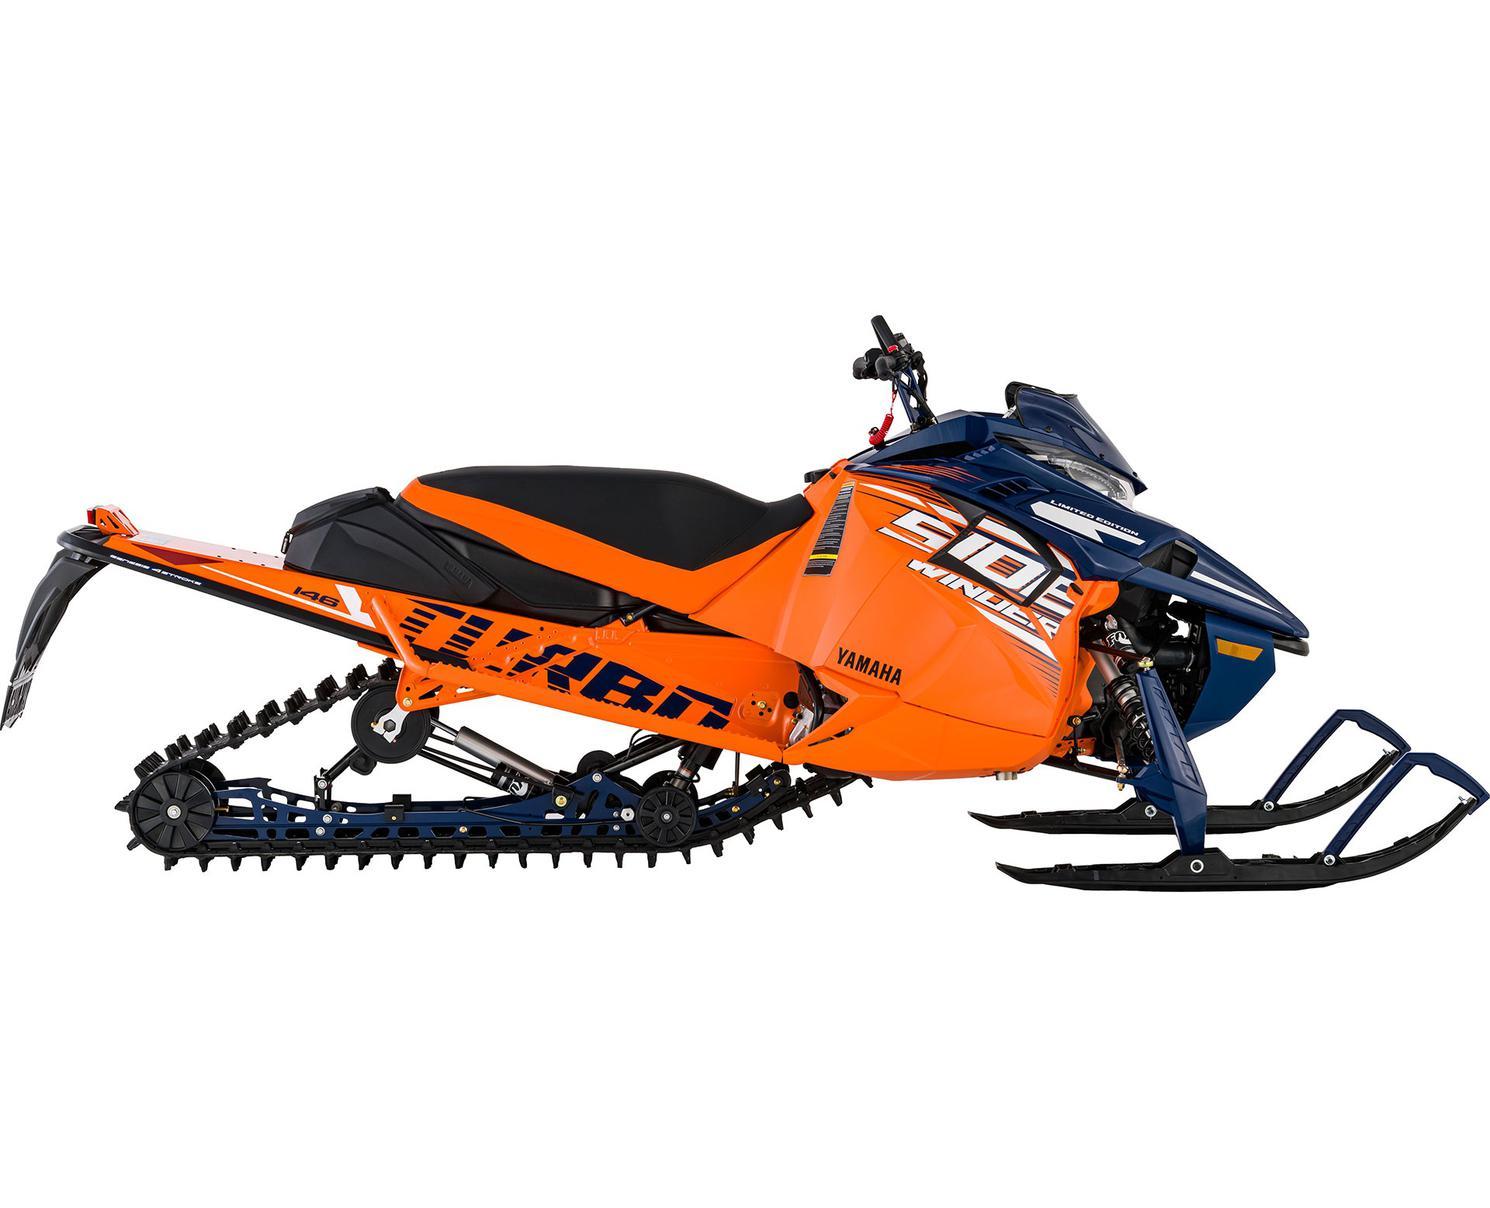 Yamaha Sidewinder X-TX LE  Bleu/Orange 2021